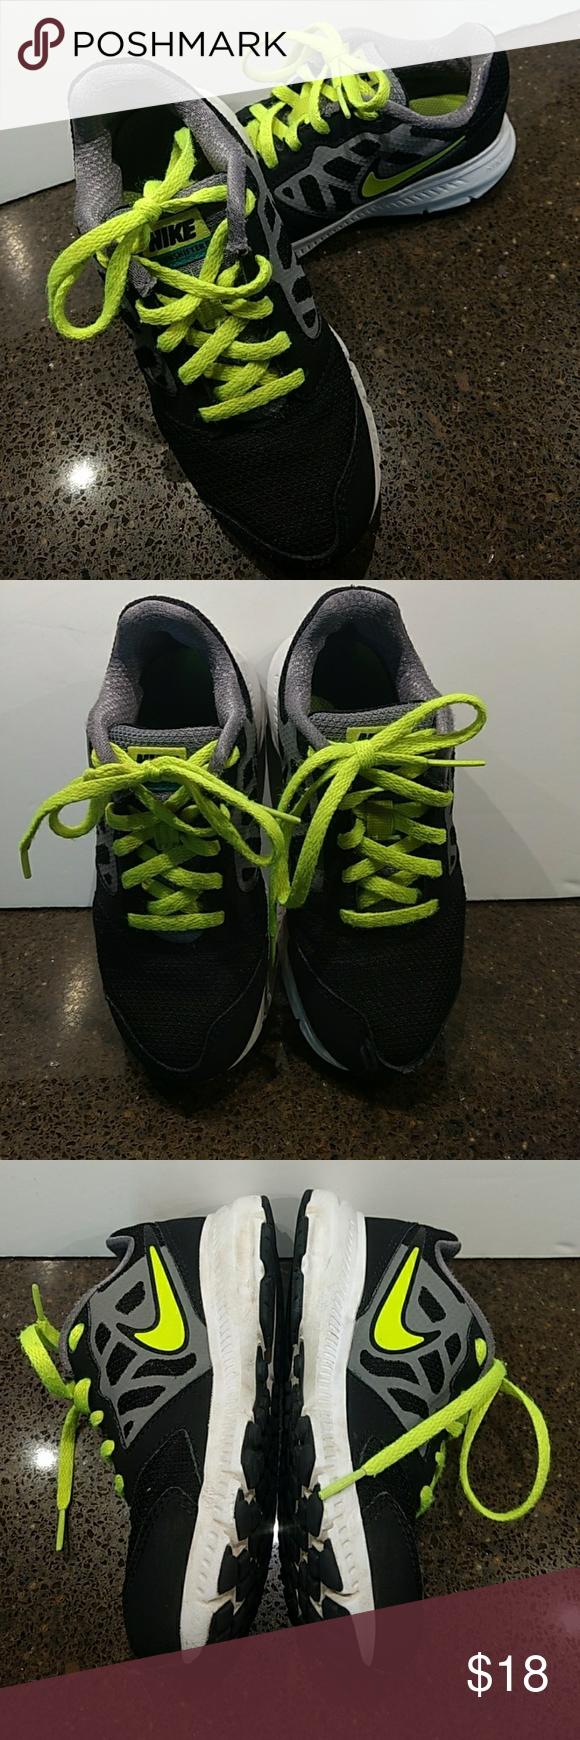 Boys Size 12 Nike Downshifter 6